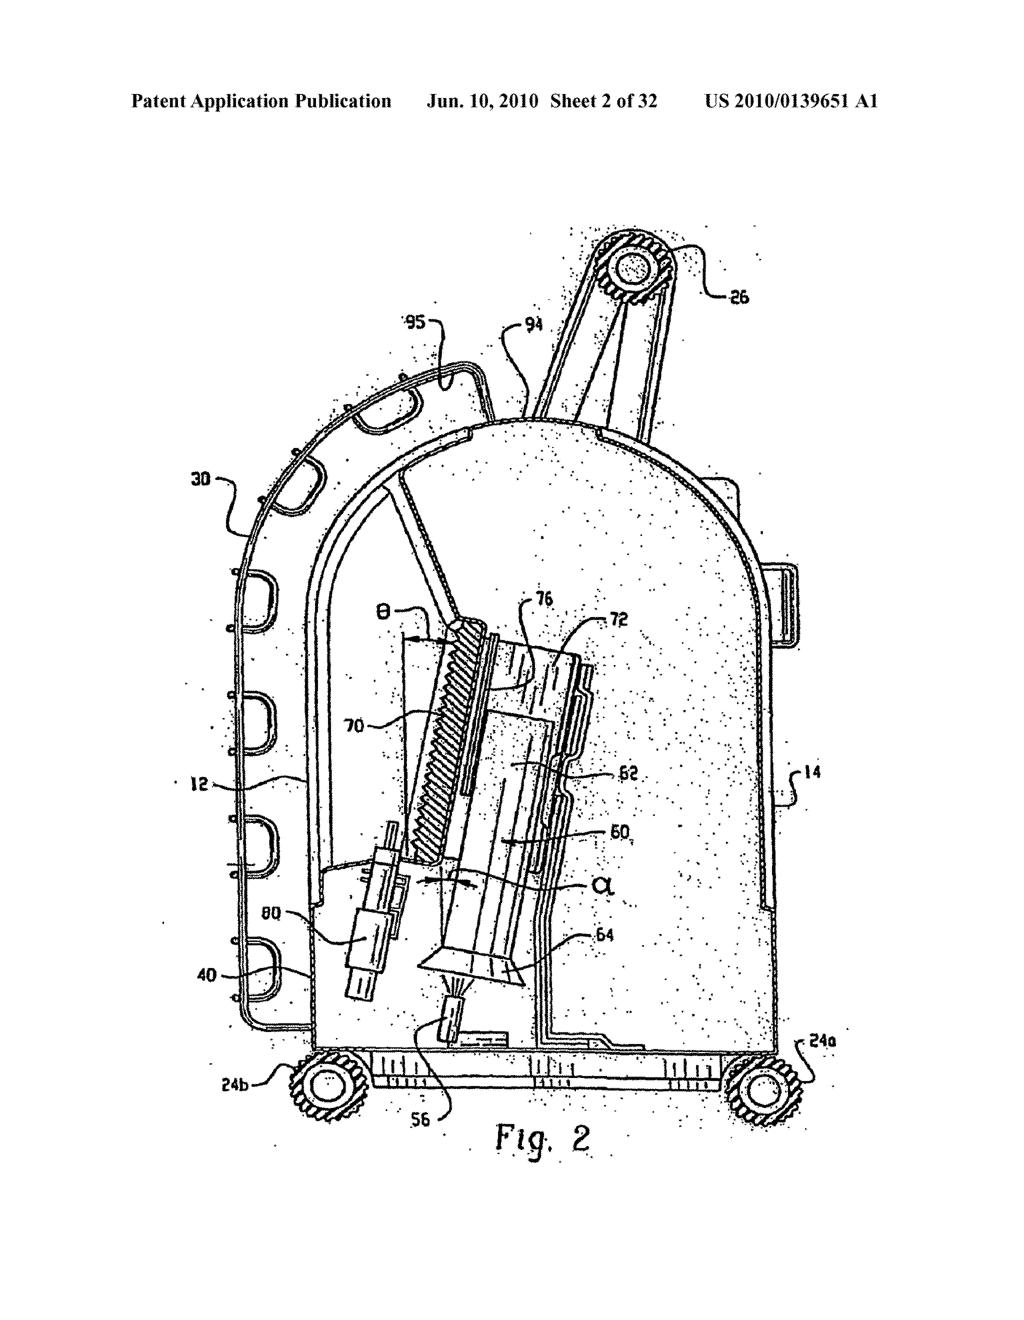 ae86 cooling fan wiring diagram